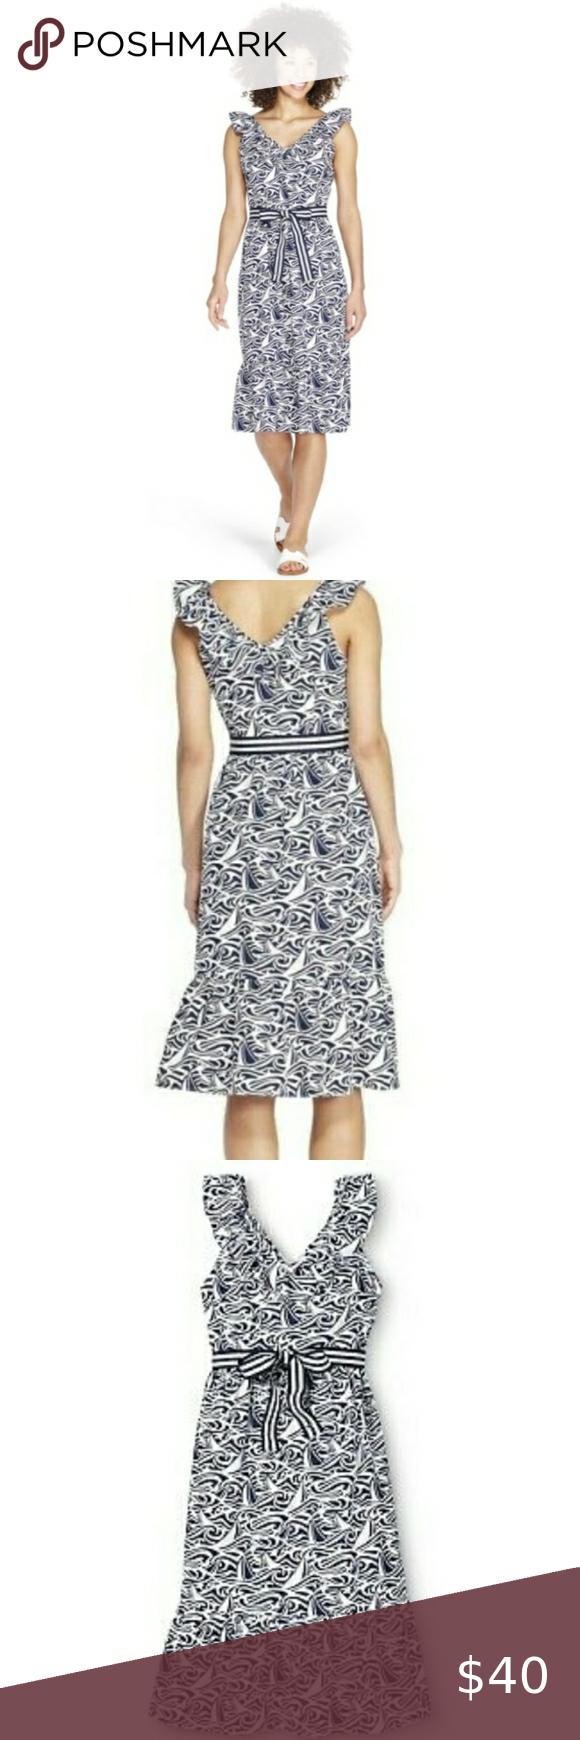 Nwot Vineyard Vines Sleeveless Ruffled Dress Dresses Clothes Design Womens Dresses [ 1740 x 580 Pixel ]